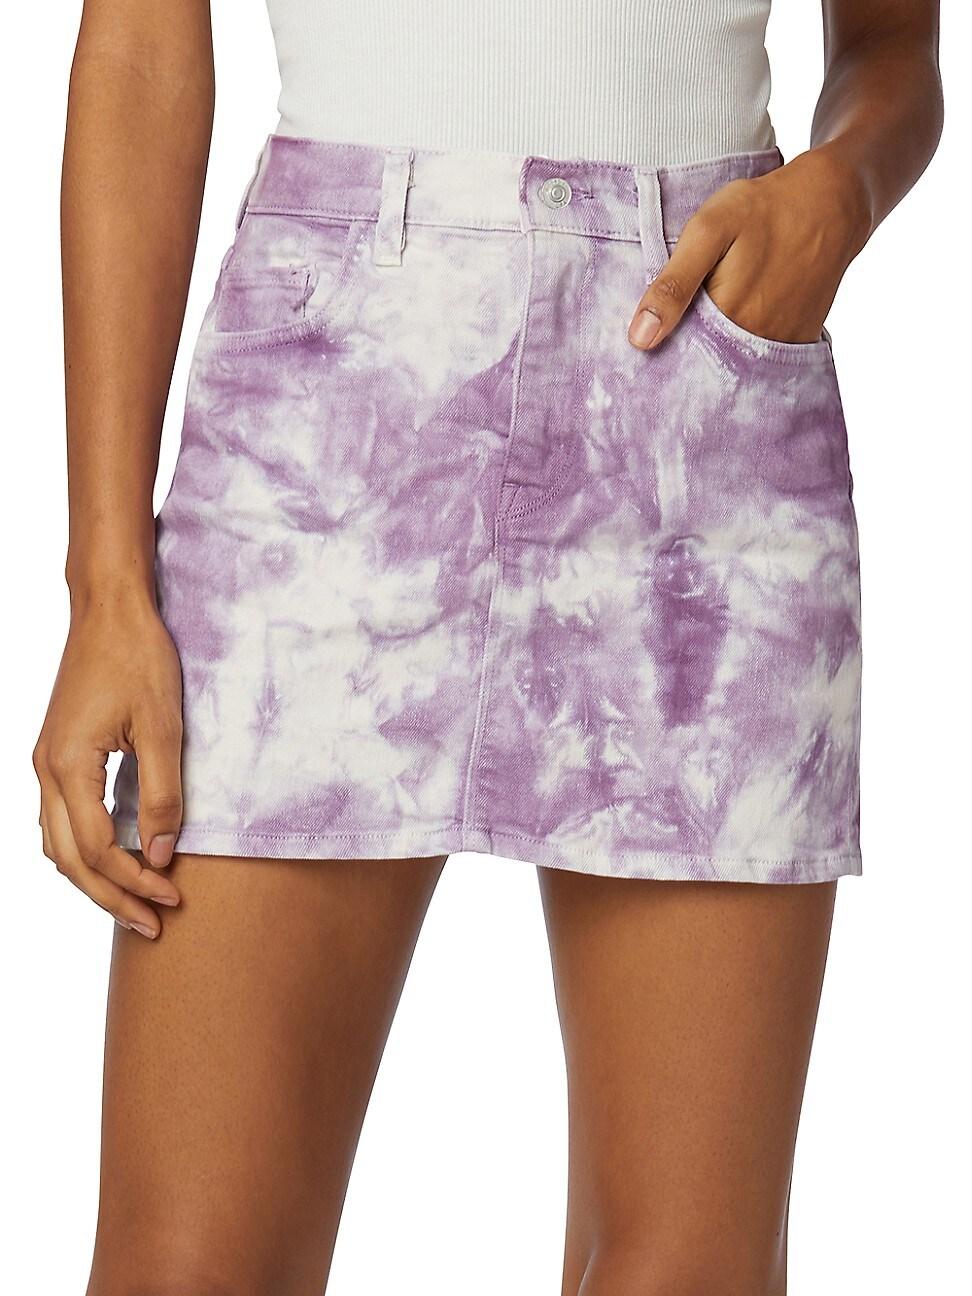 Hudson Mini skirts WOMEN'S THE VIPER TIE-DYE MINI SKIRT